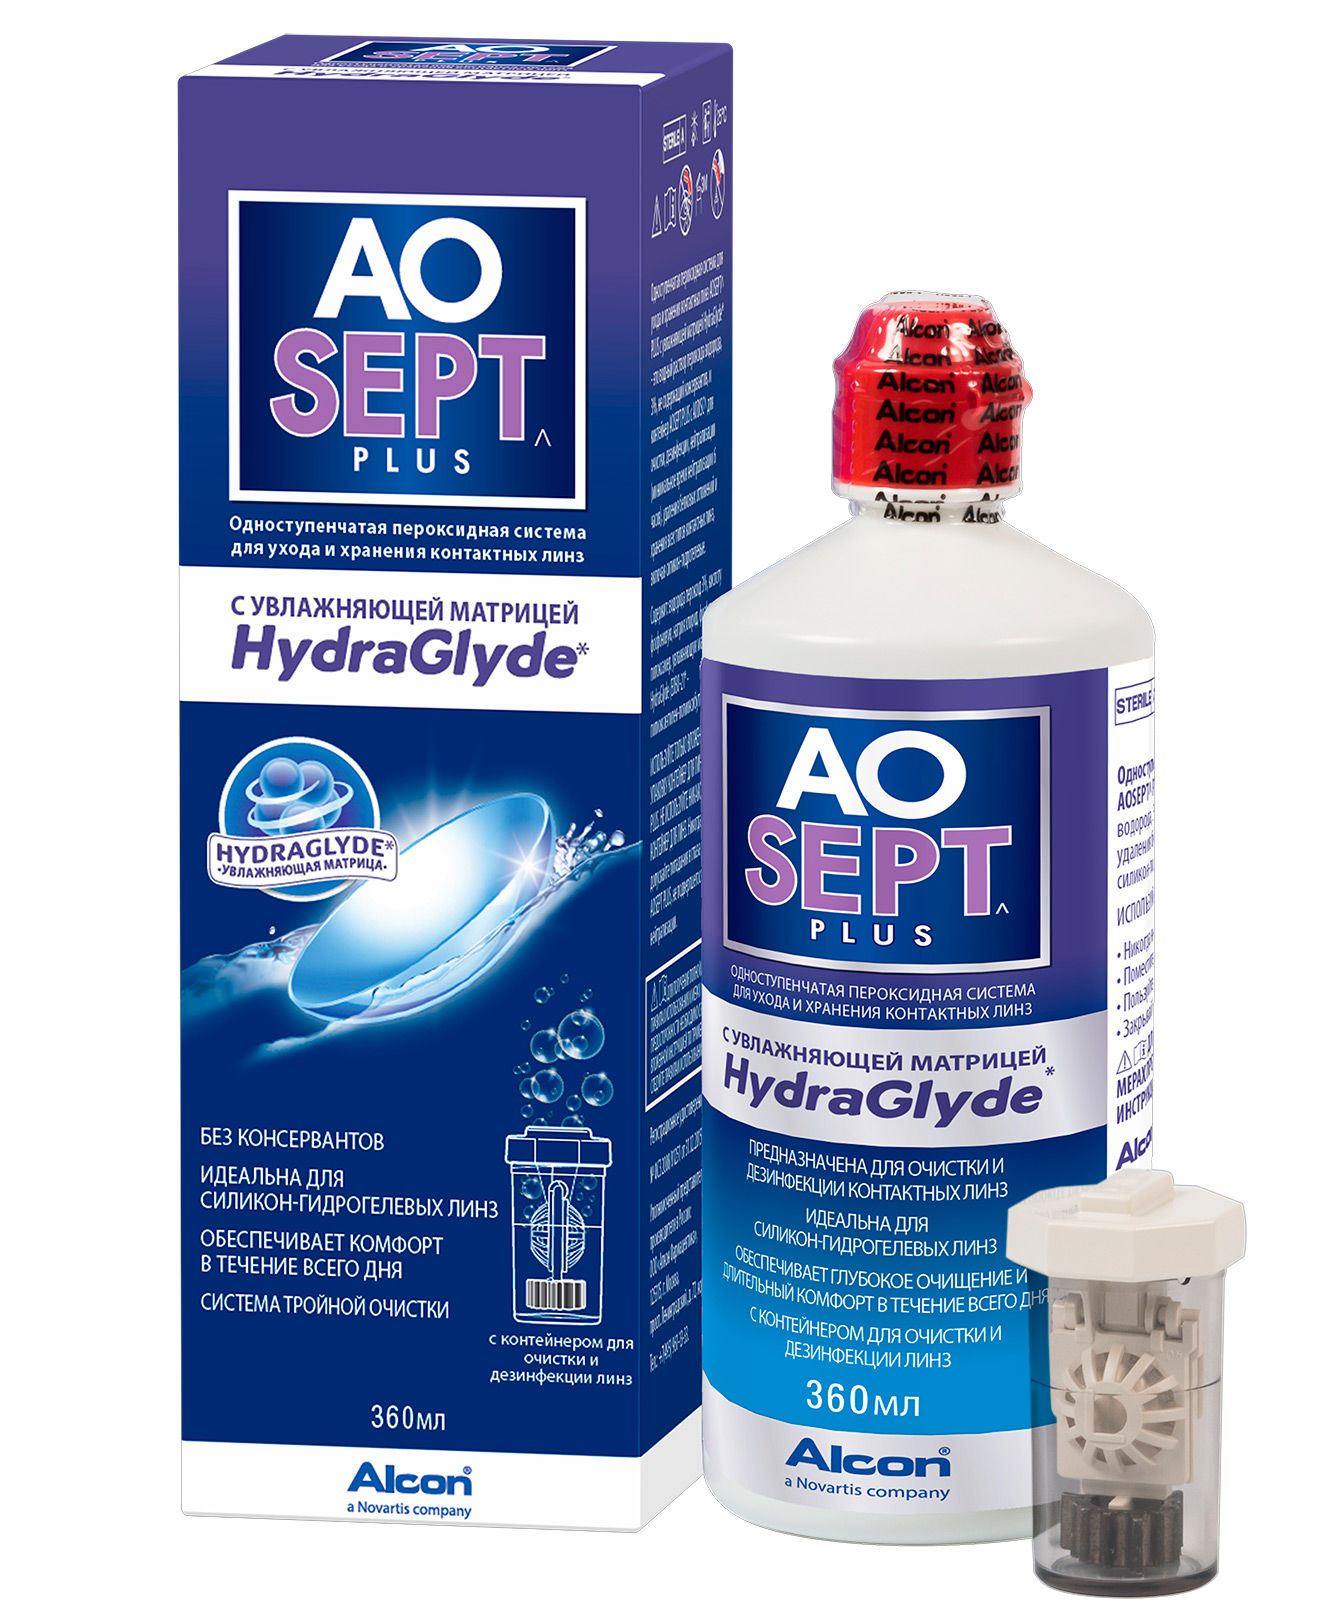 Outlet-Store große Auswahl an Farben billiger Verkauf Пероксидная система для ухода за контактными линзами AOSept-Plus с  HydraGlyde